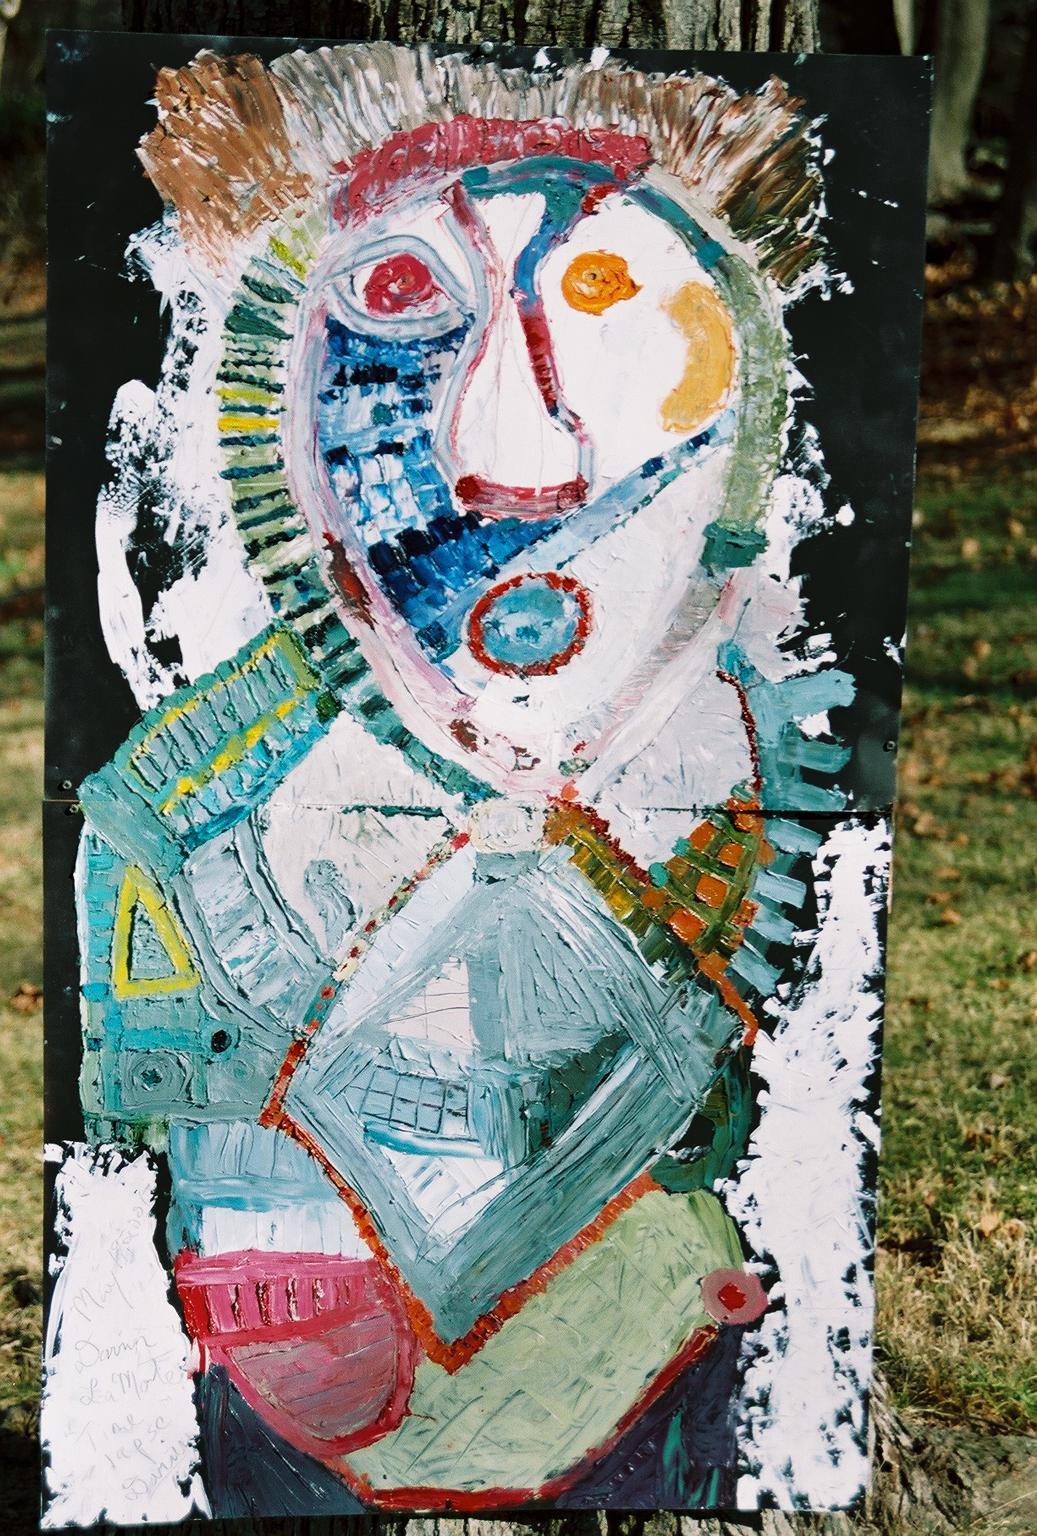 The Artist Showcase-Time-Lapse